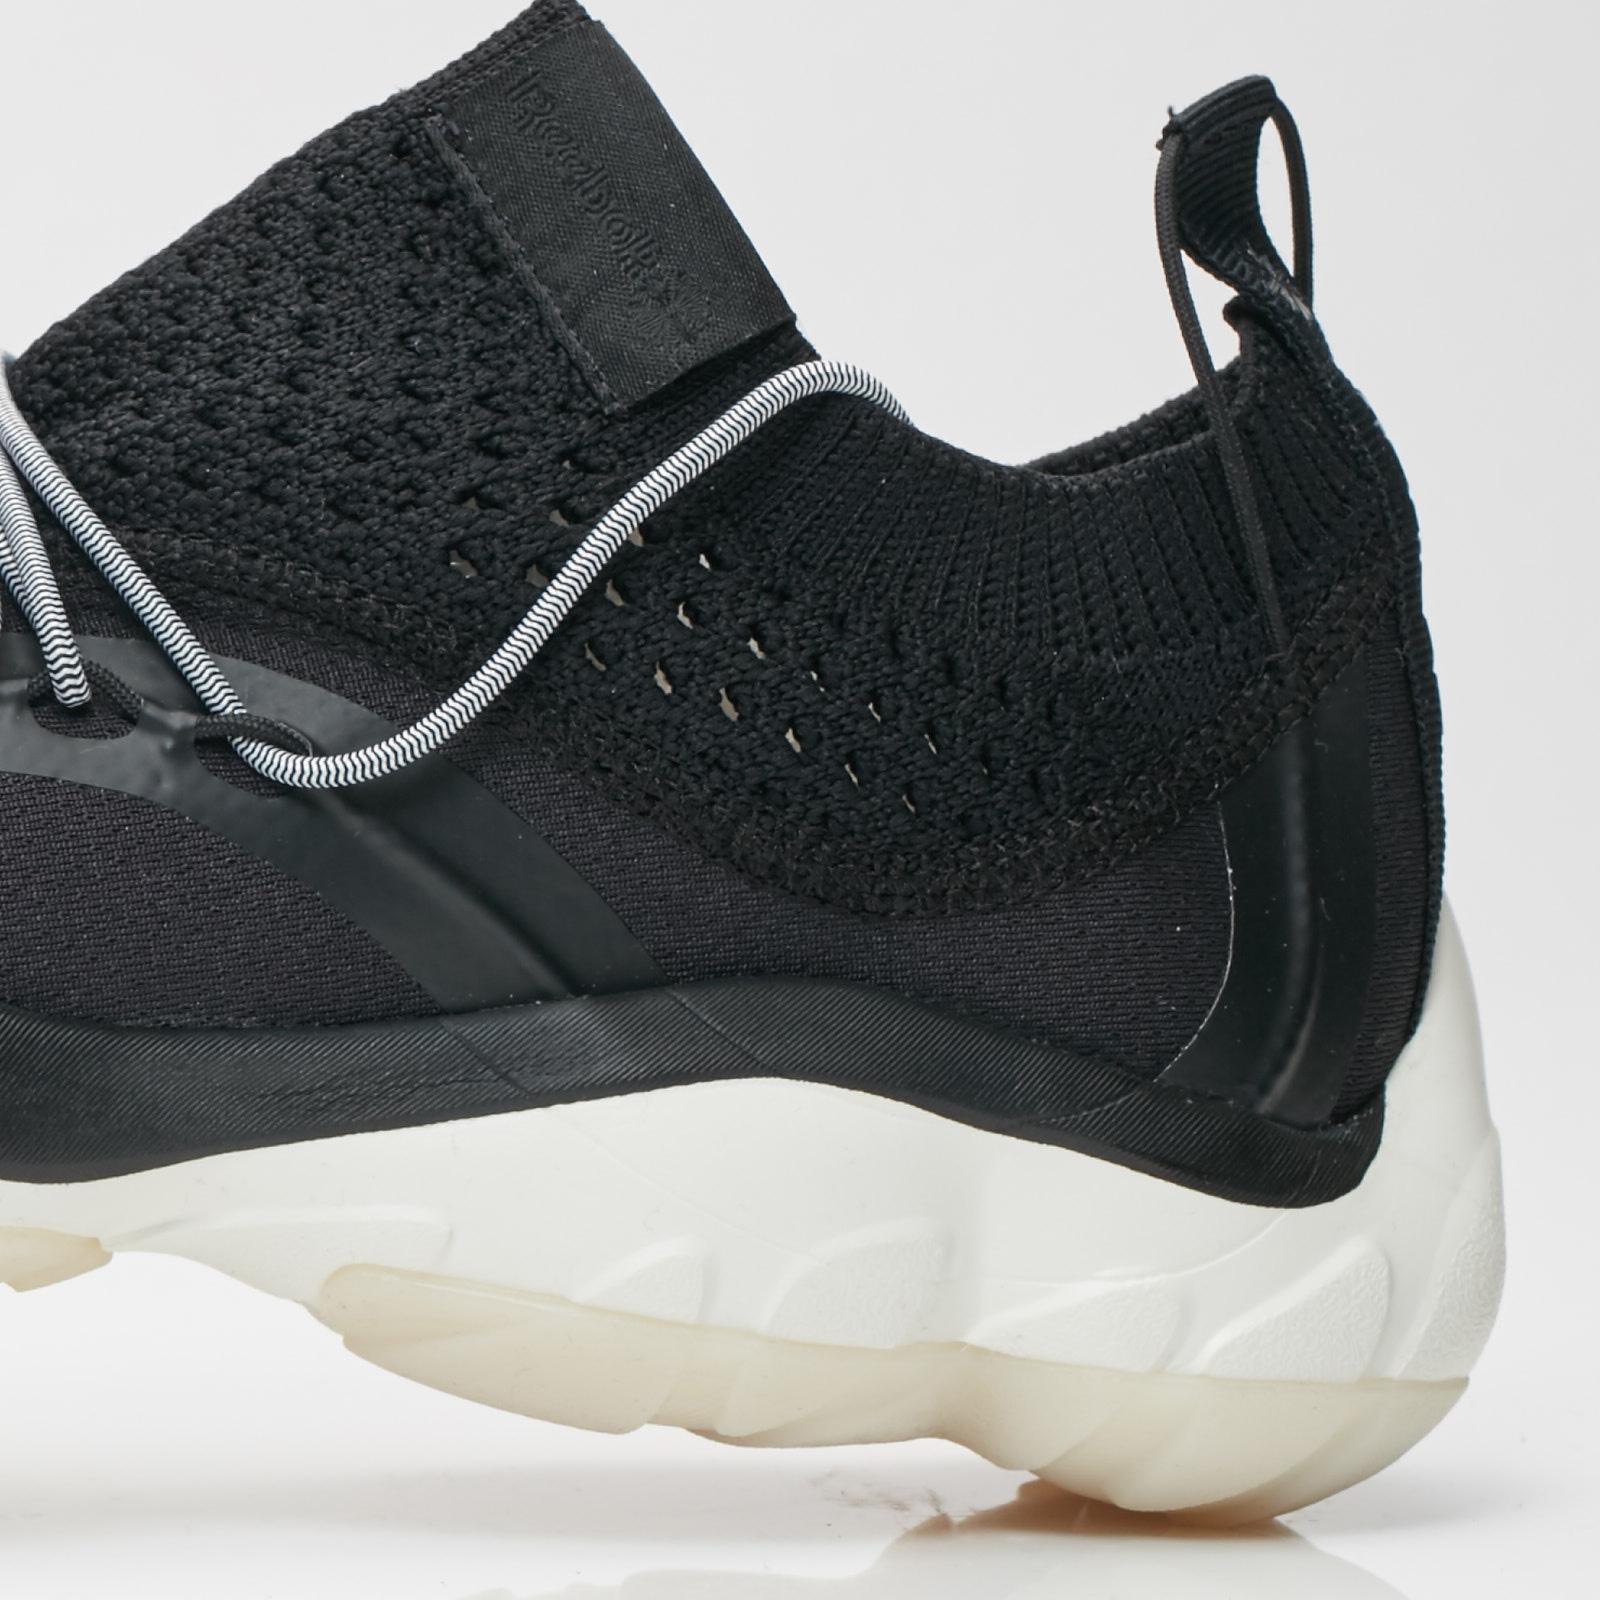 a2c7f008ade199 Reebok DMX Fusion CI - Cm9650 - Sneakersnstuff